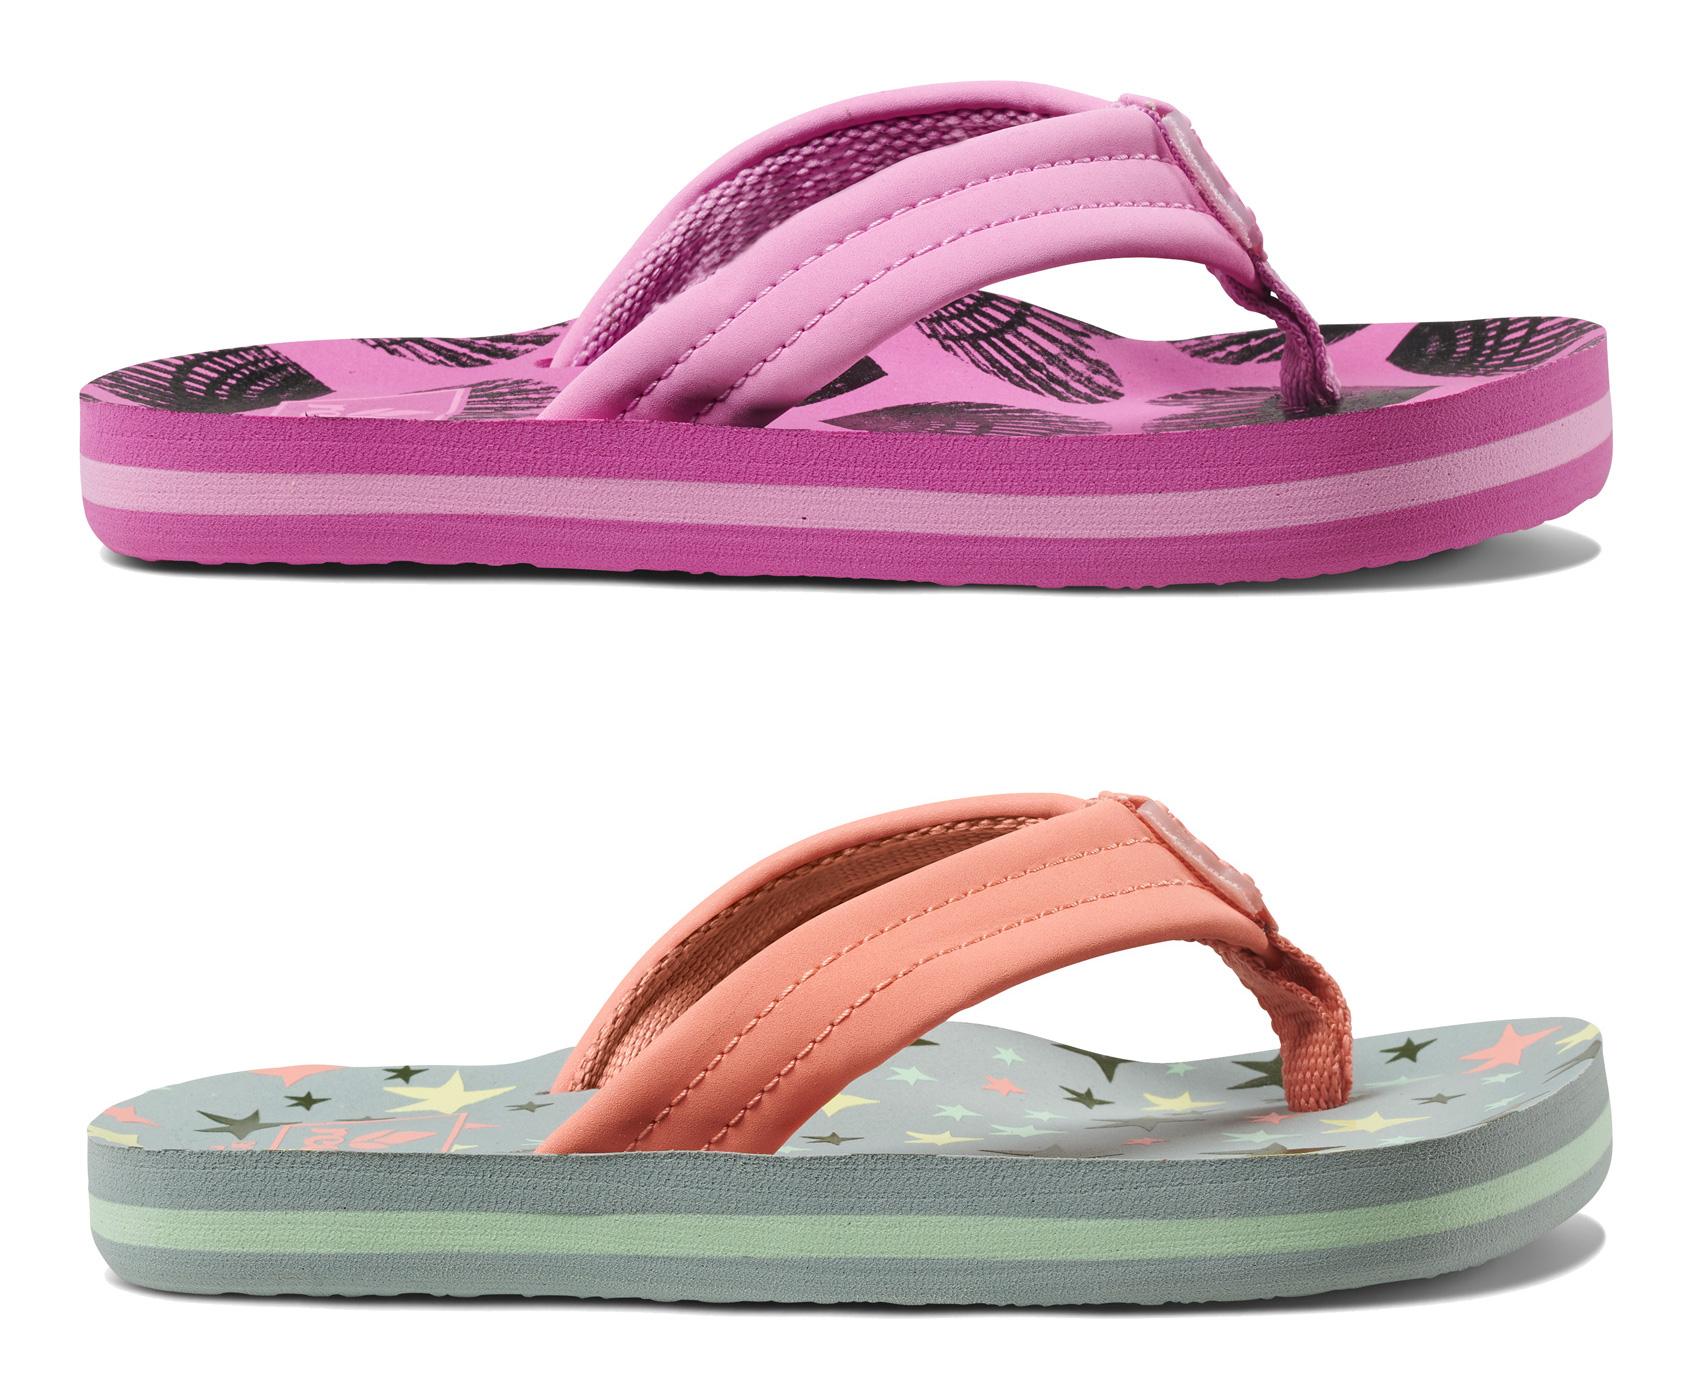 1abe81eb1700 Sentinel reef kids flip flops little ahi girls hearts shell pink stripes  jpg 1700x1400 Shell flip